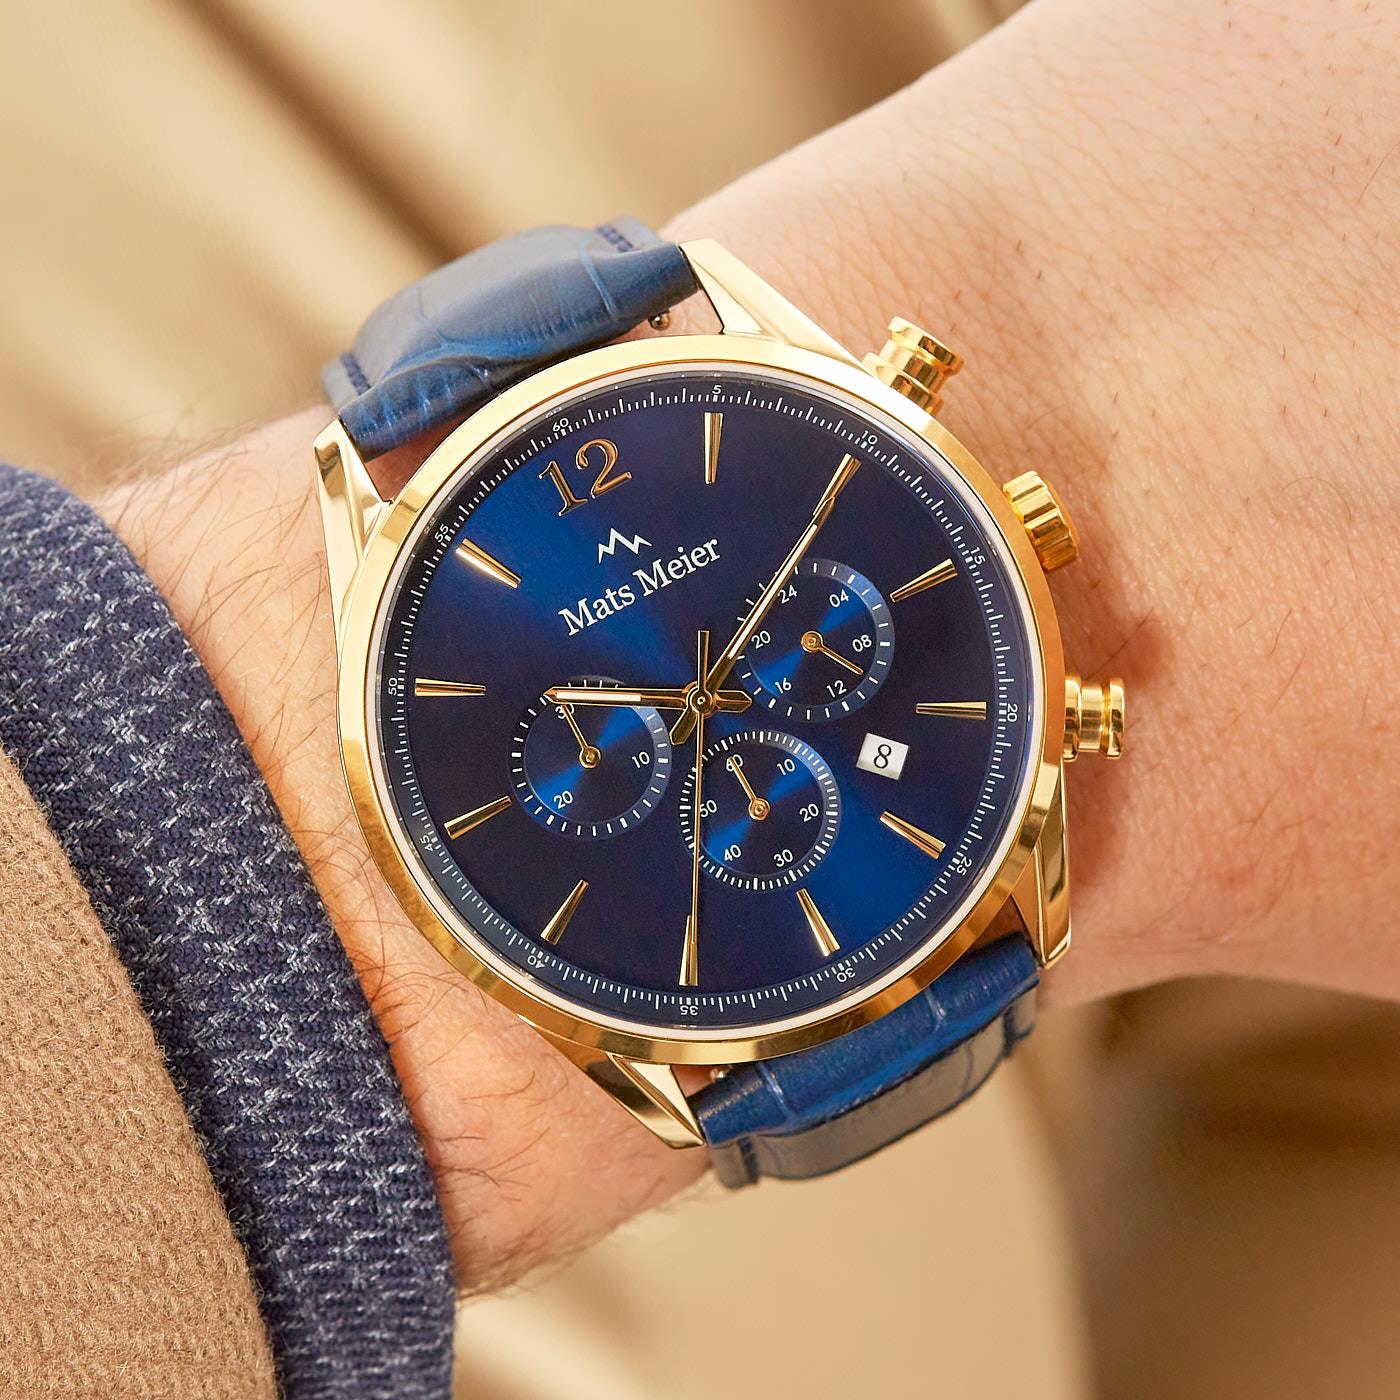 Mats Meier Grand Cornier chronograph watch blue/gold colored